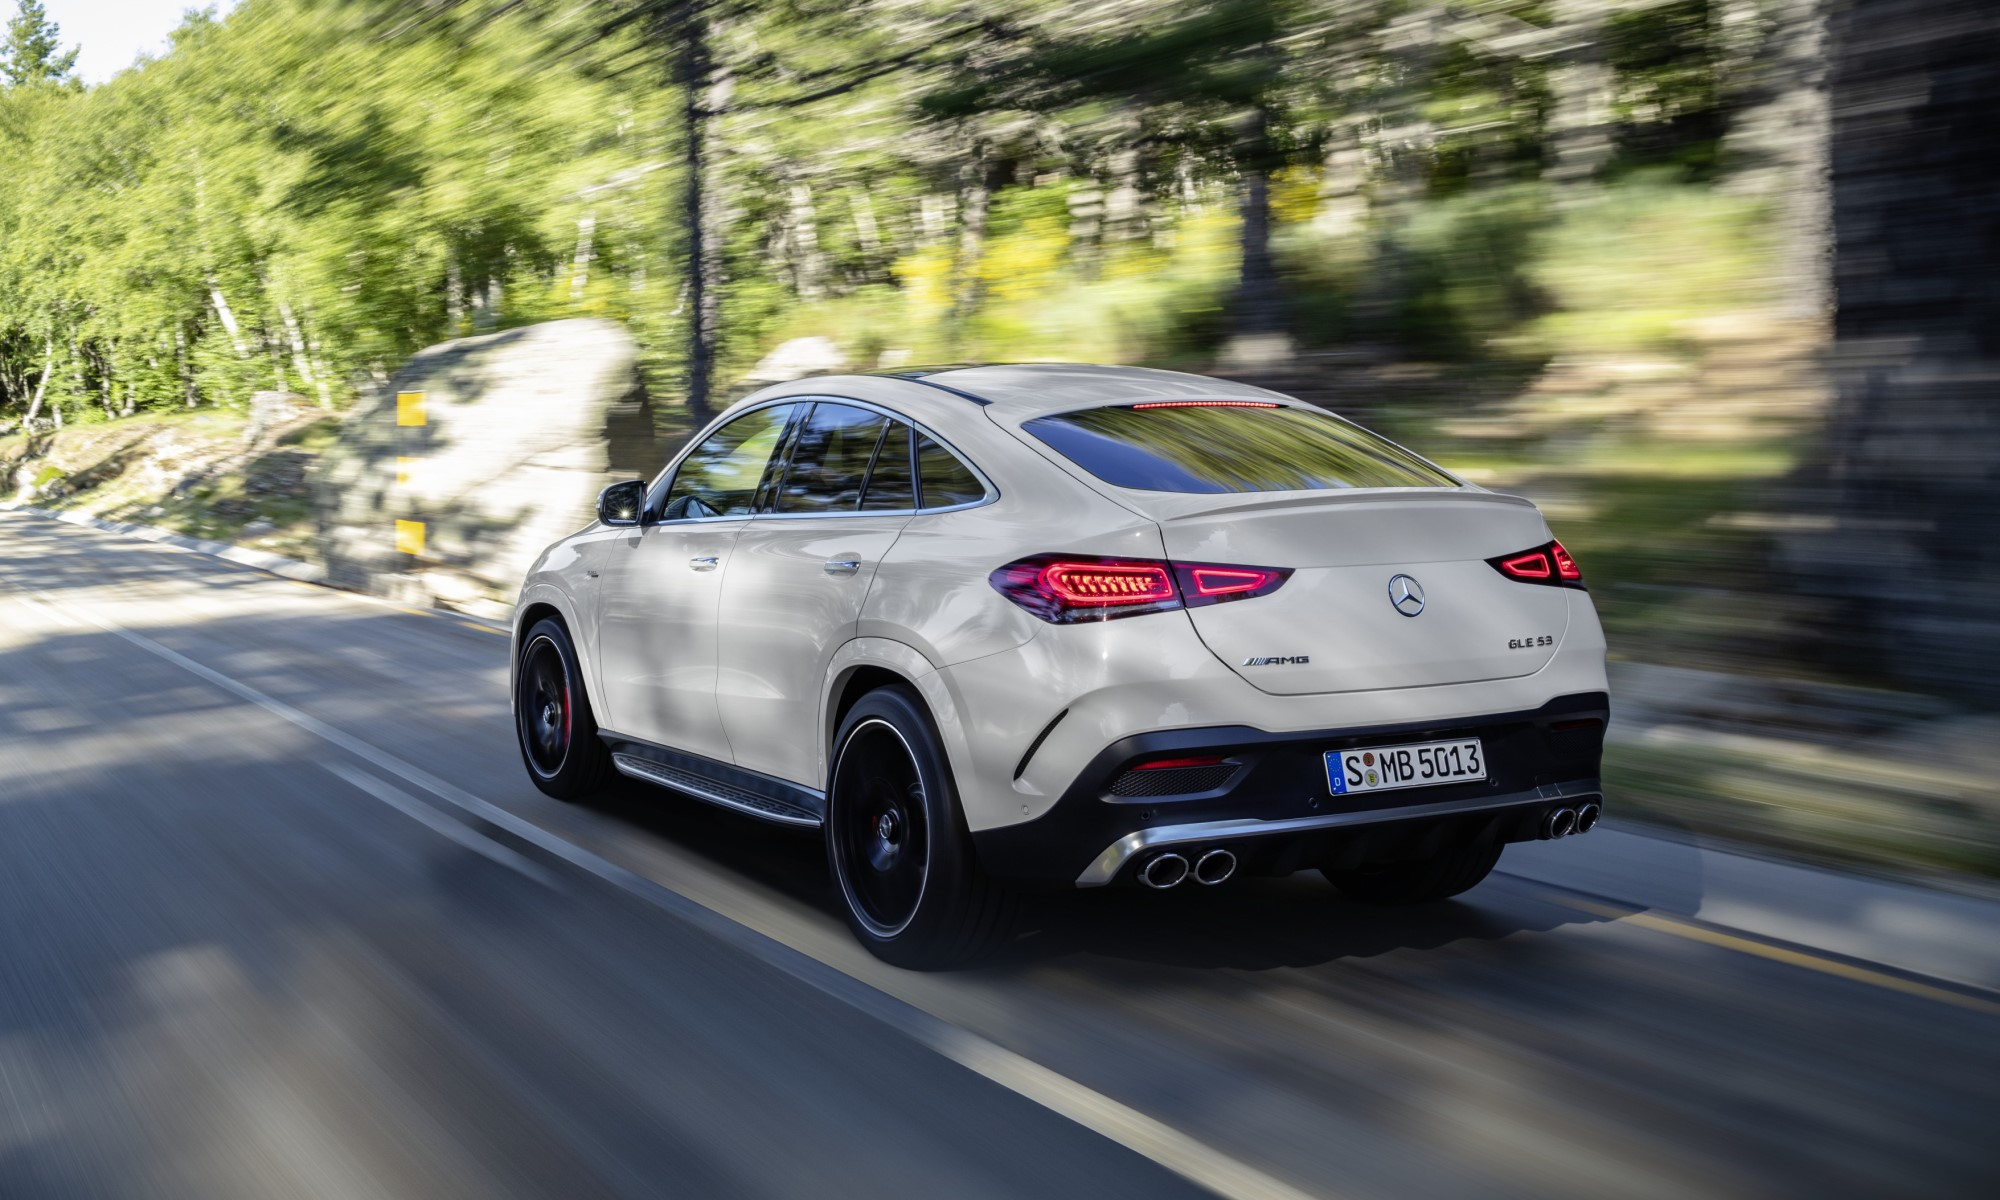 Mercedes-AMG GLE53 Coupe